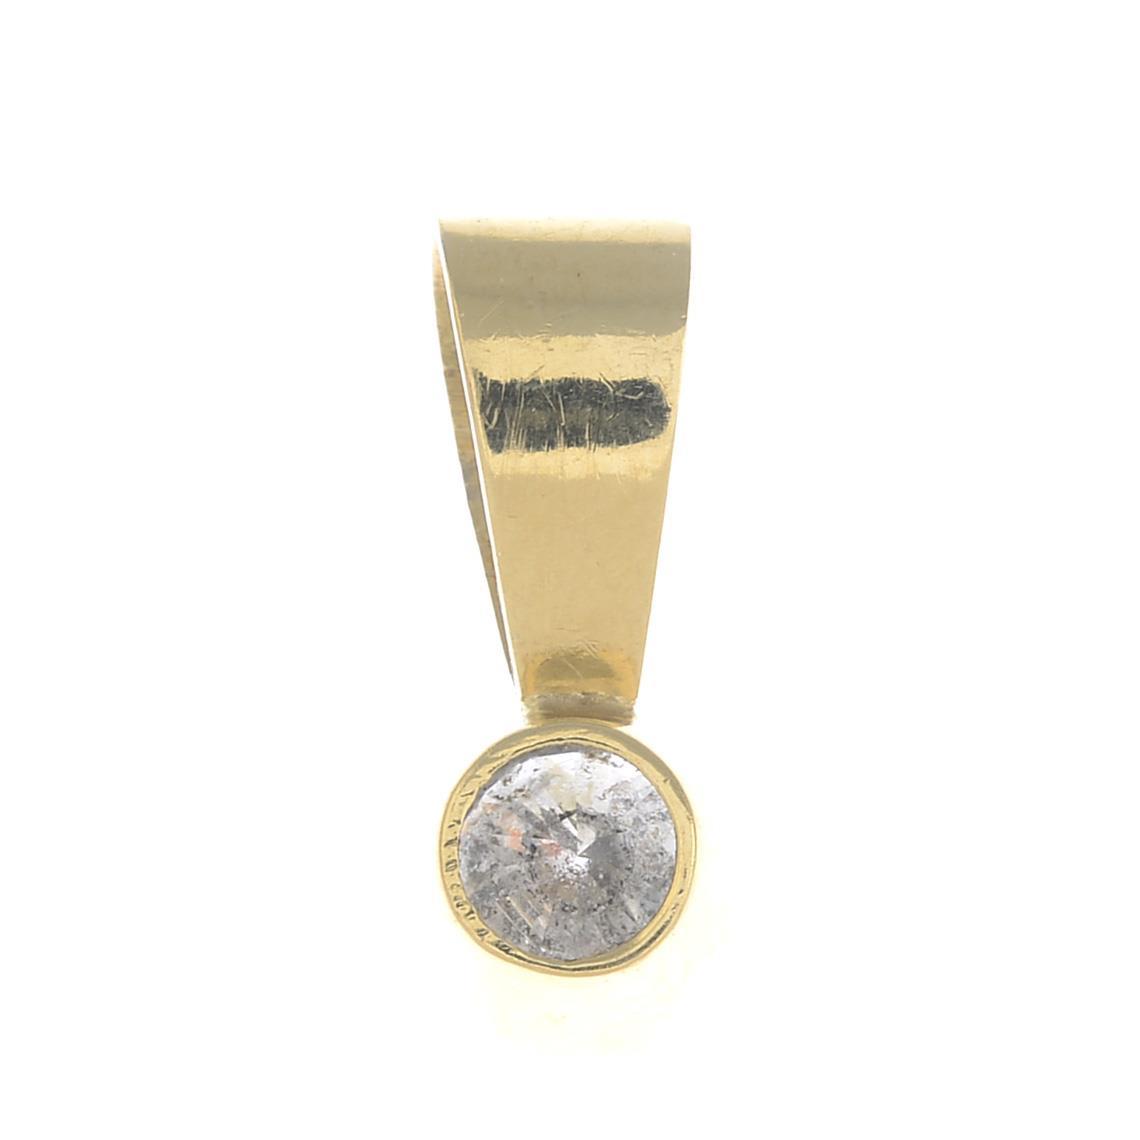 Lot 50 - A diamond single-stone pendant.Estimated diamond weight 0.70ct,